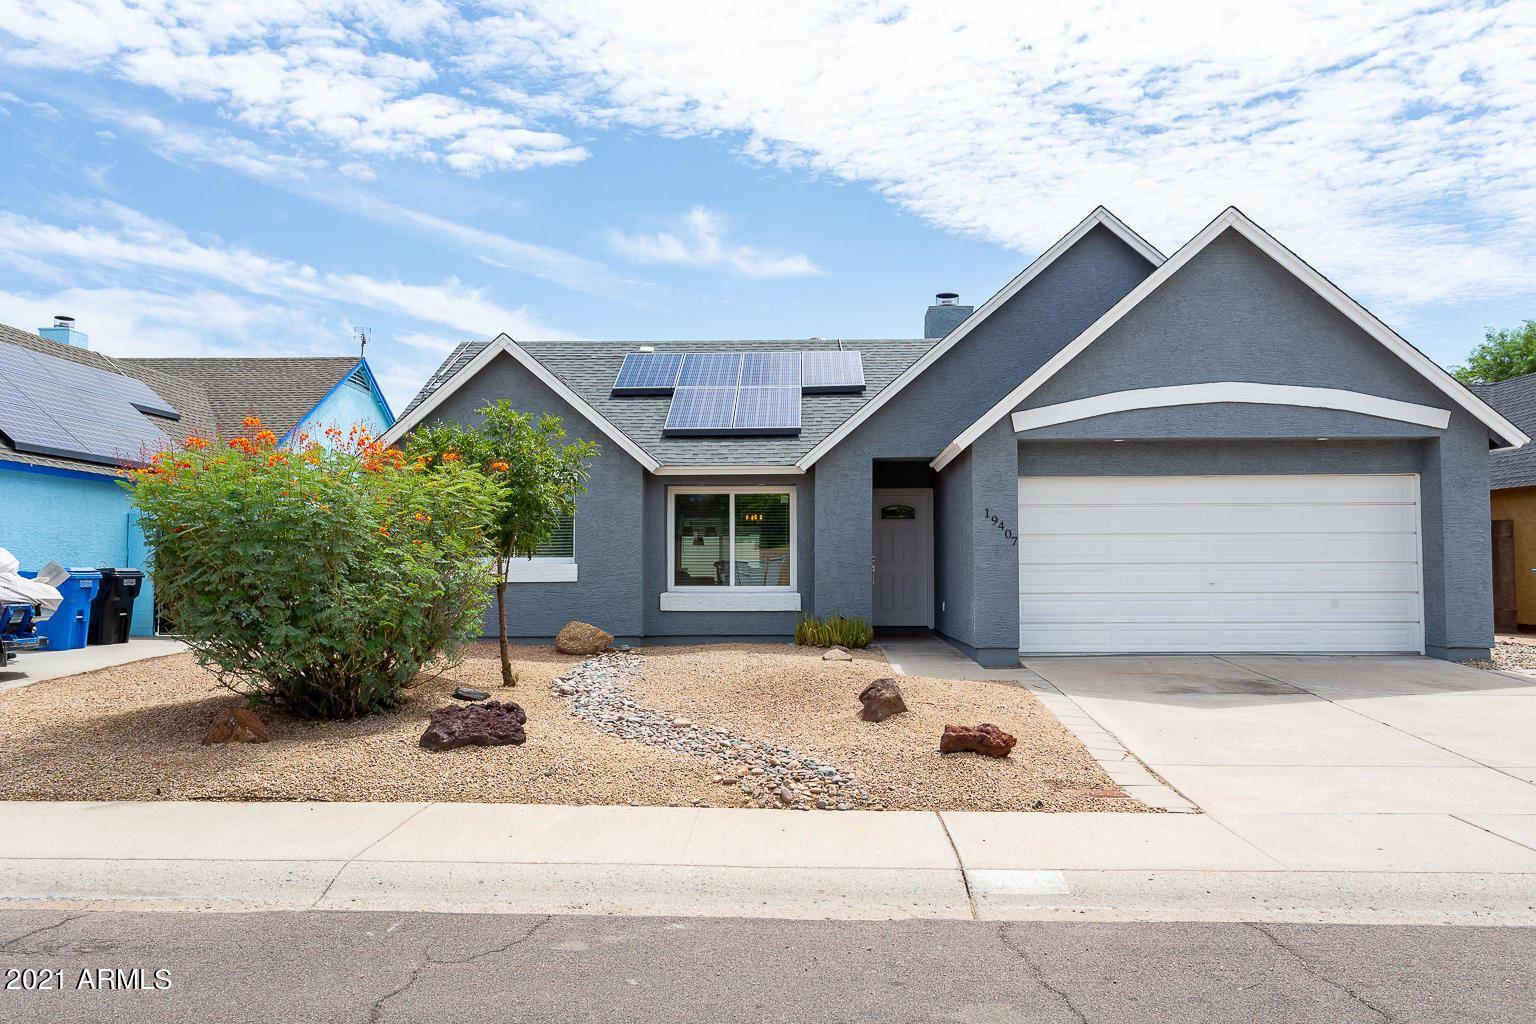 19407 N 8th Avenue, Phoenix, AZ 85027 - MLS#: 6272427